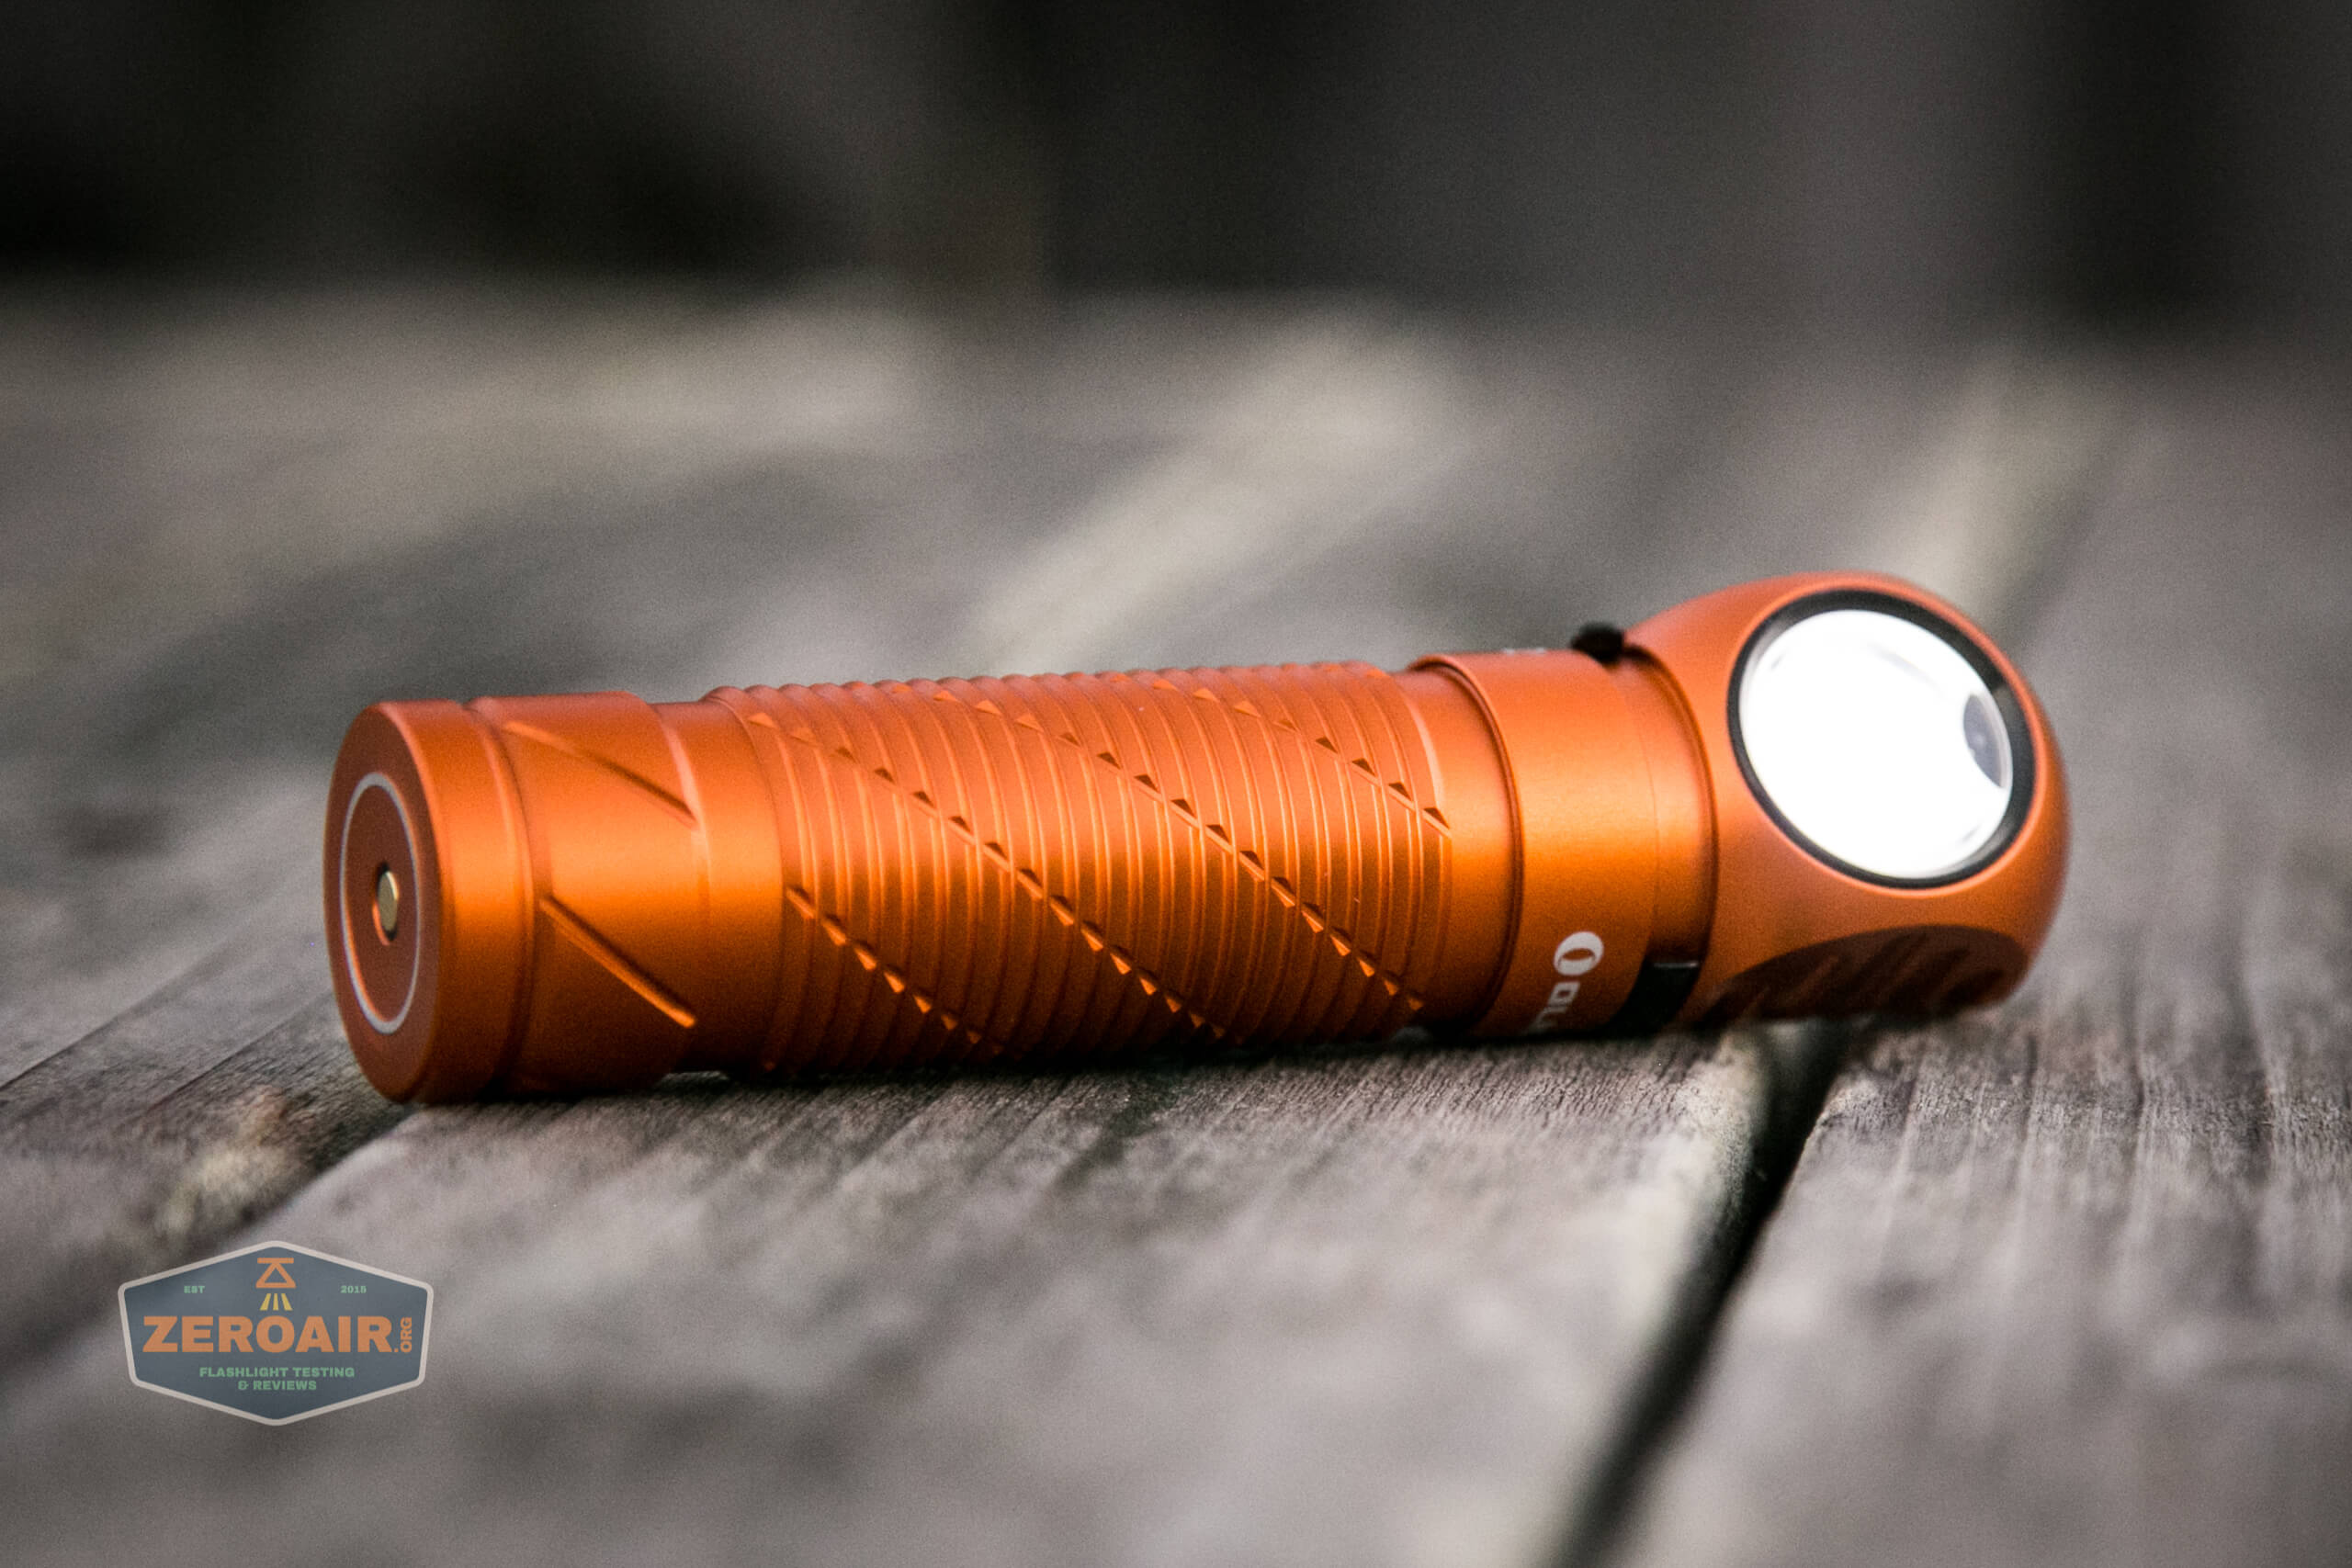 olight perun 2 21700 headlamp orange on low